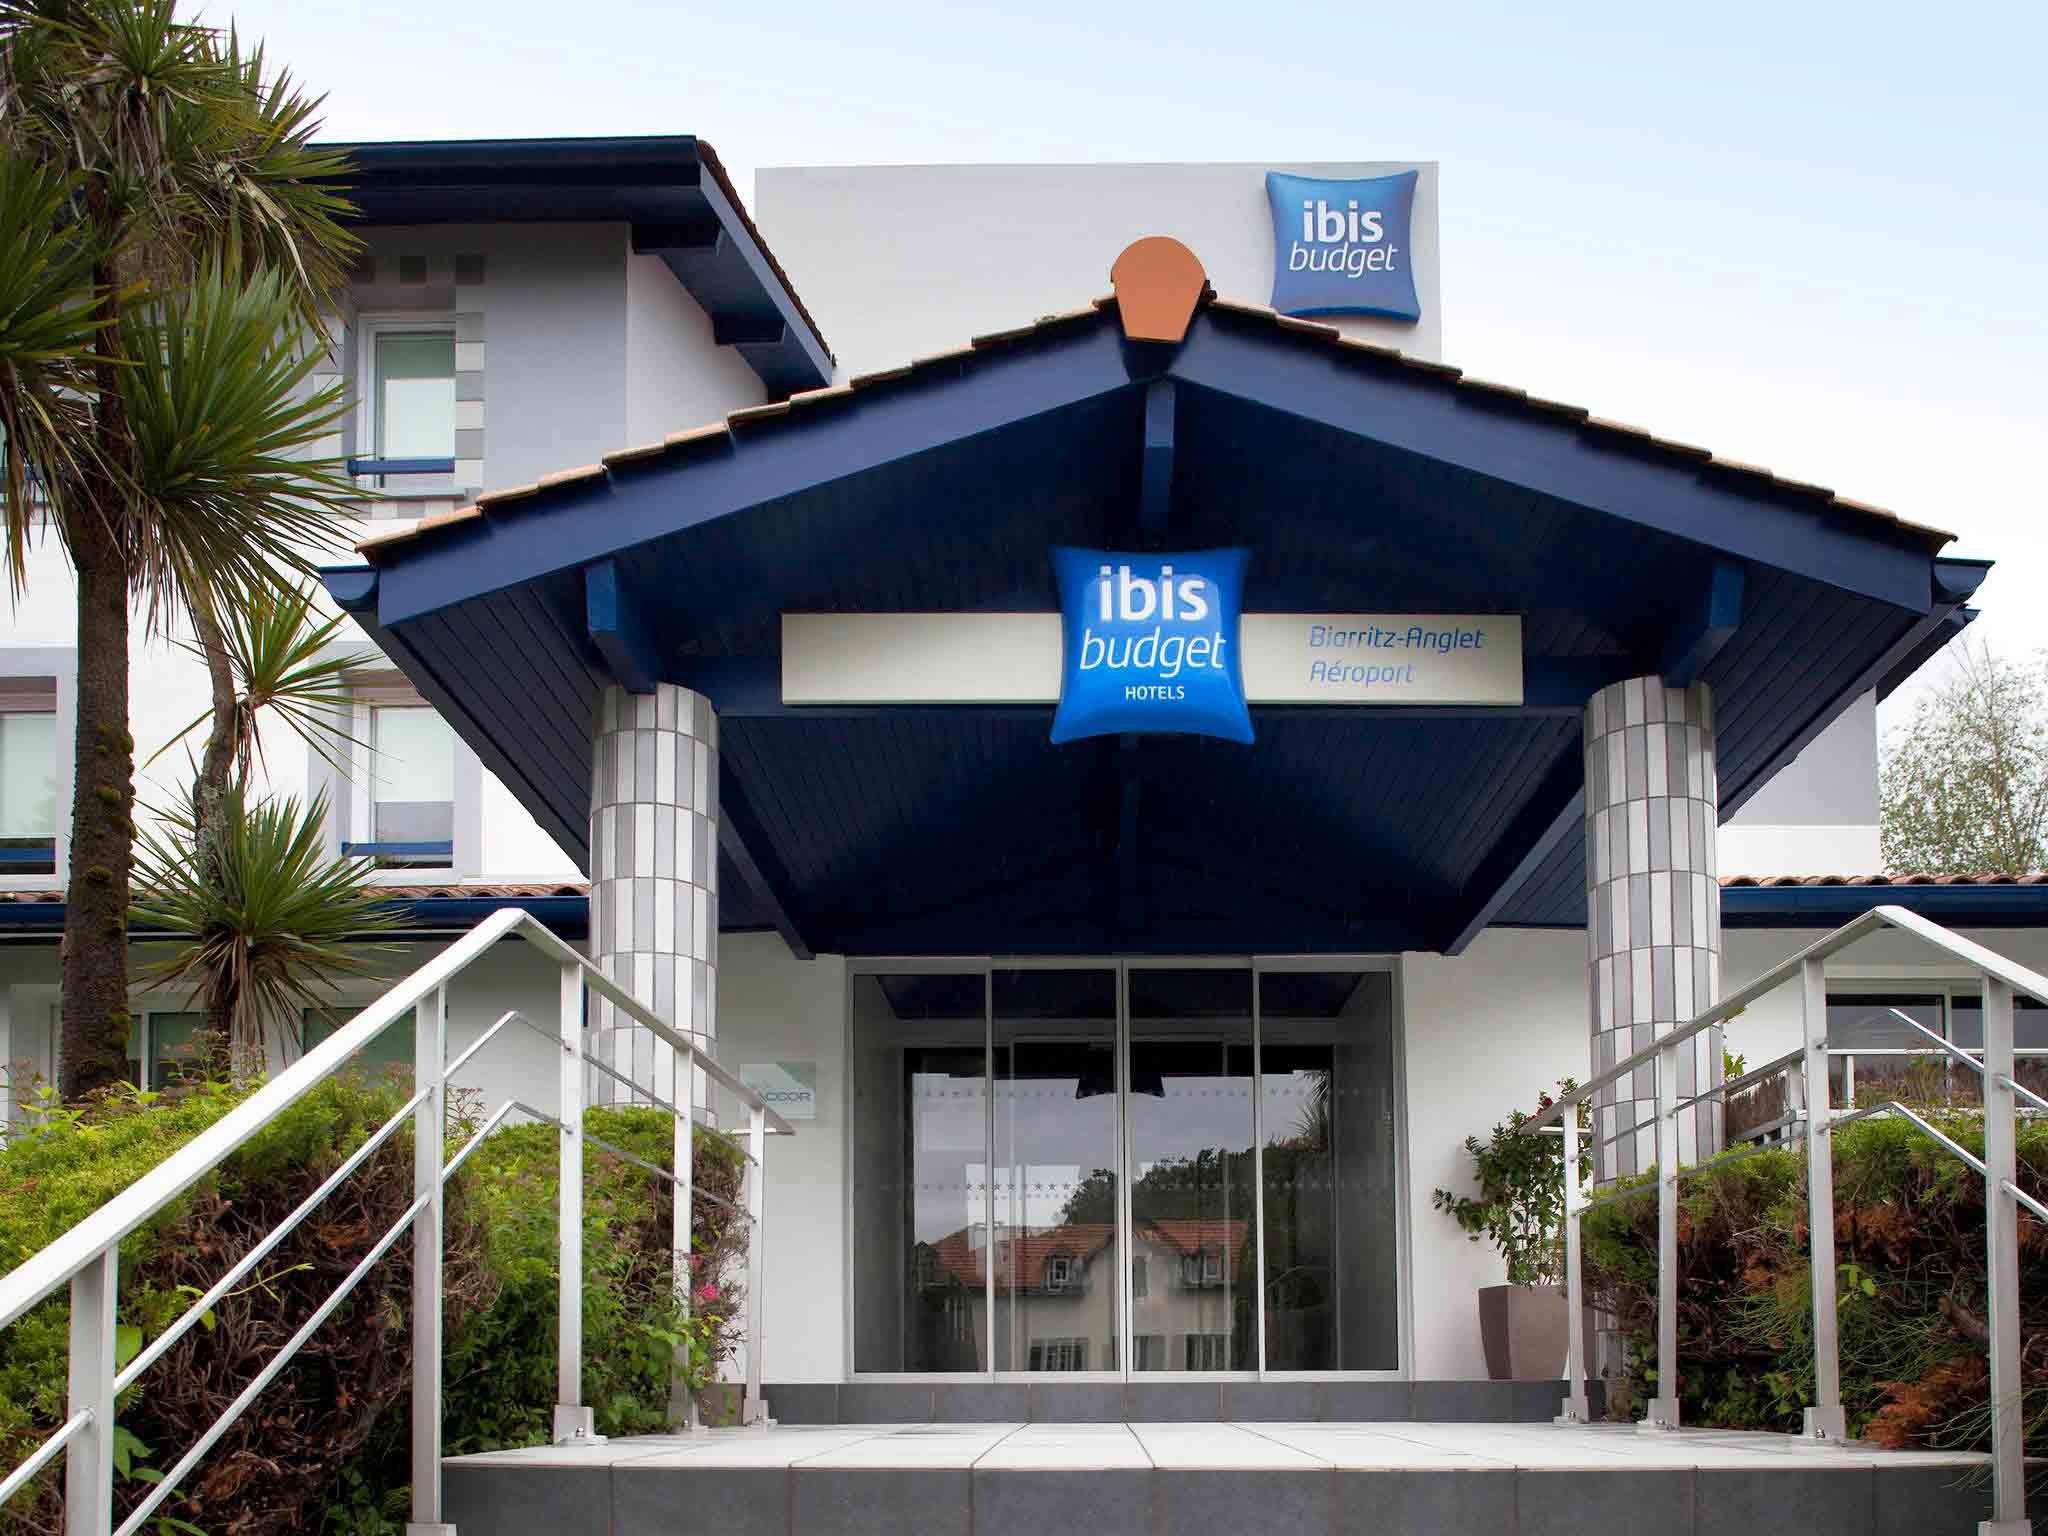 Hotell – ibis budget Biarritz Anglet